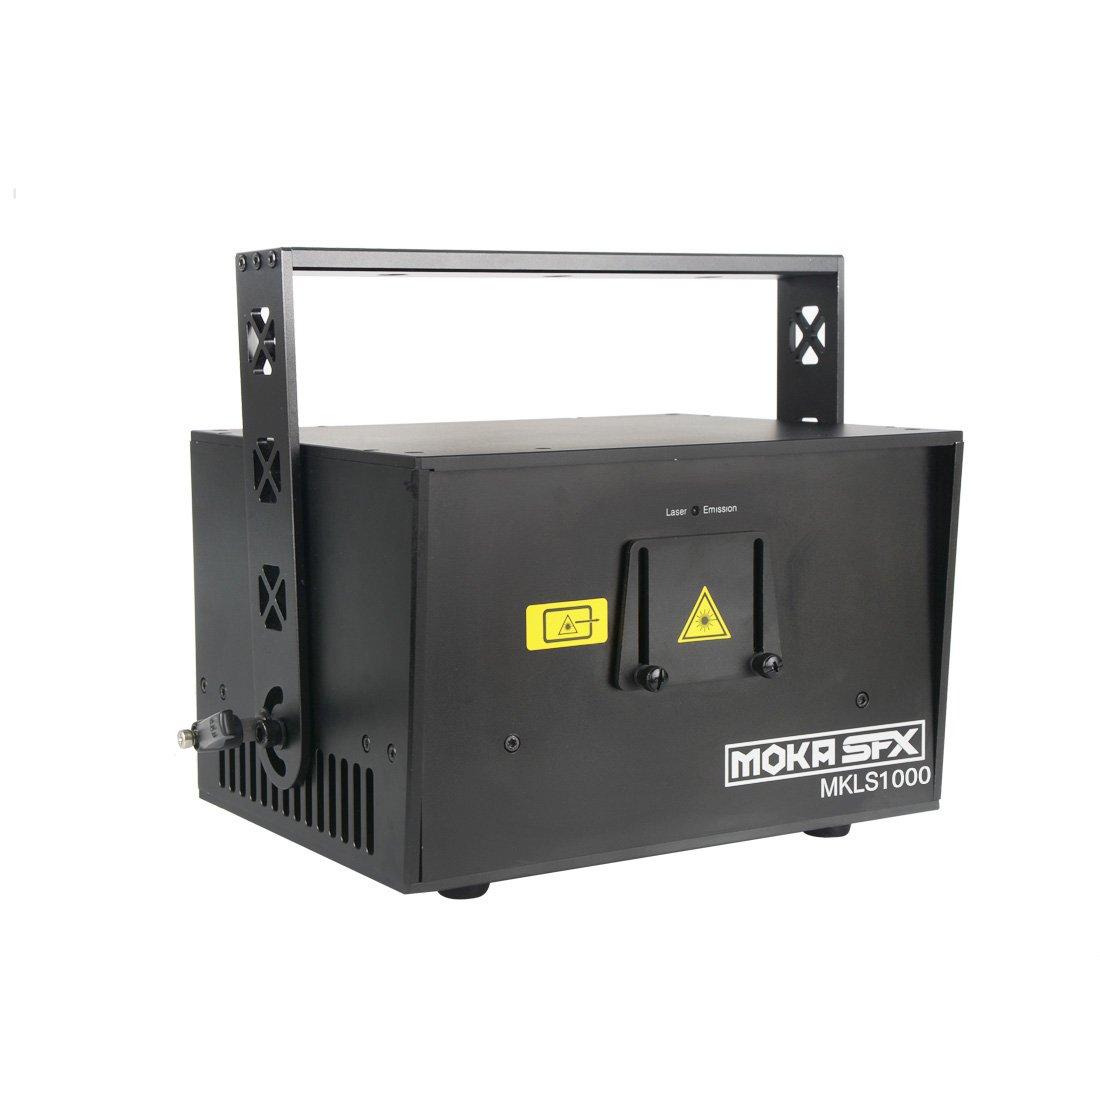 1w laser light